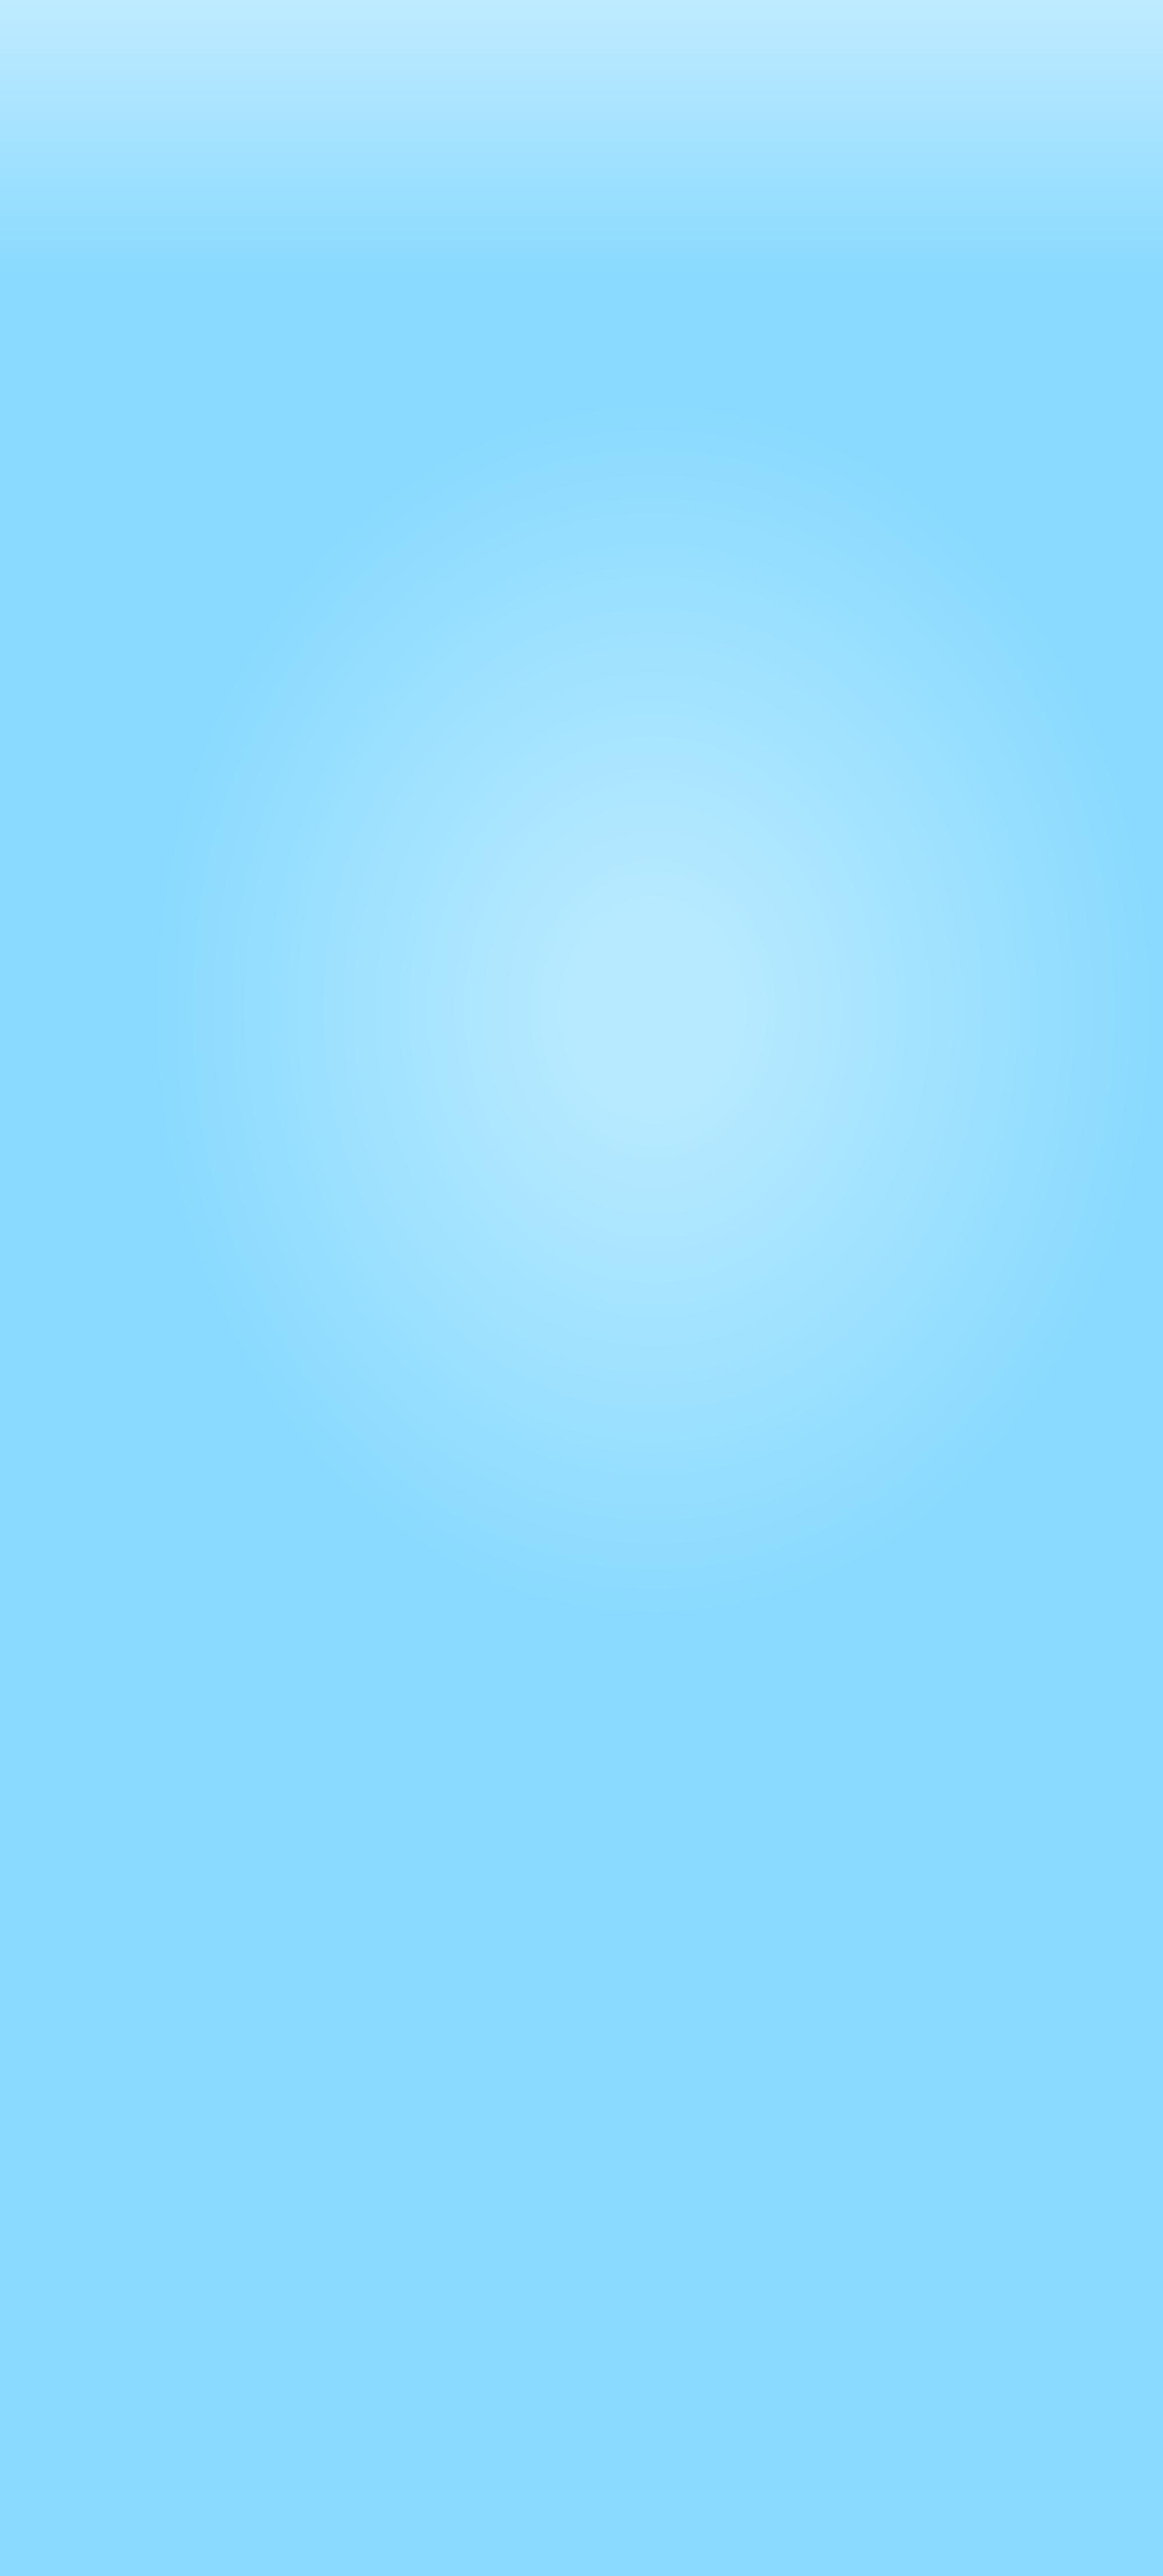 GreenWave Behance_180 Web_02-01.png